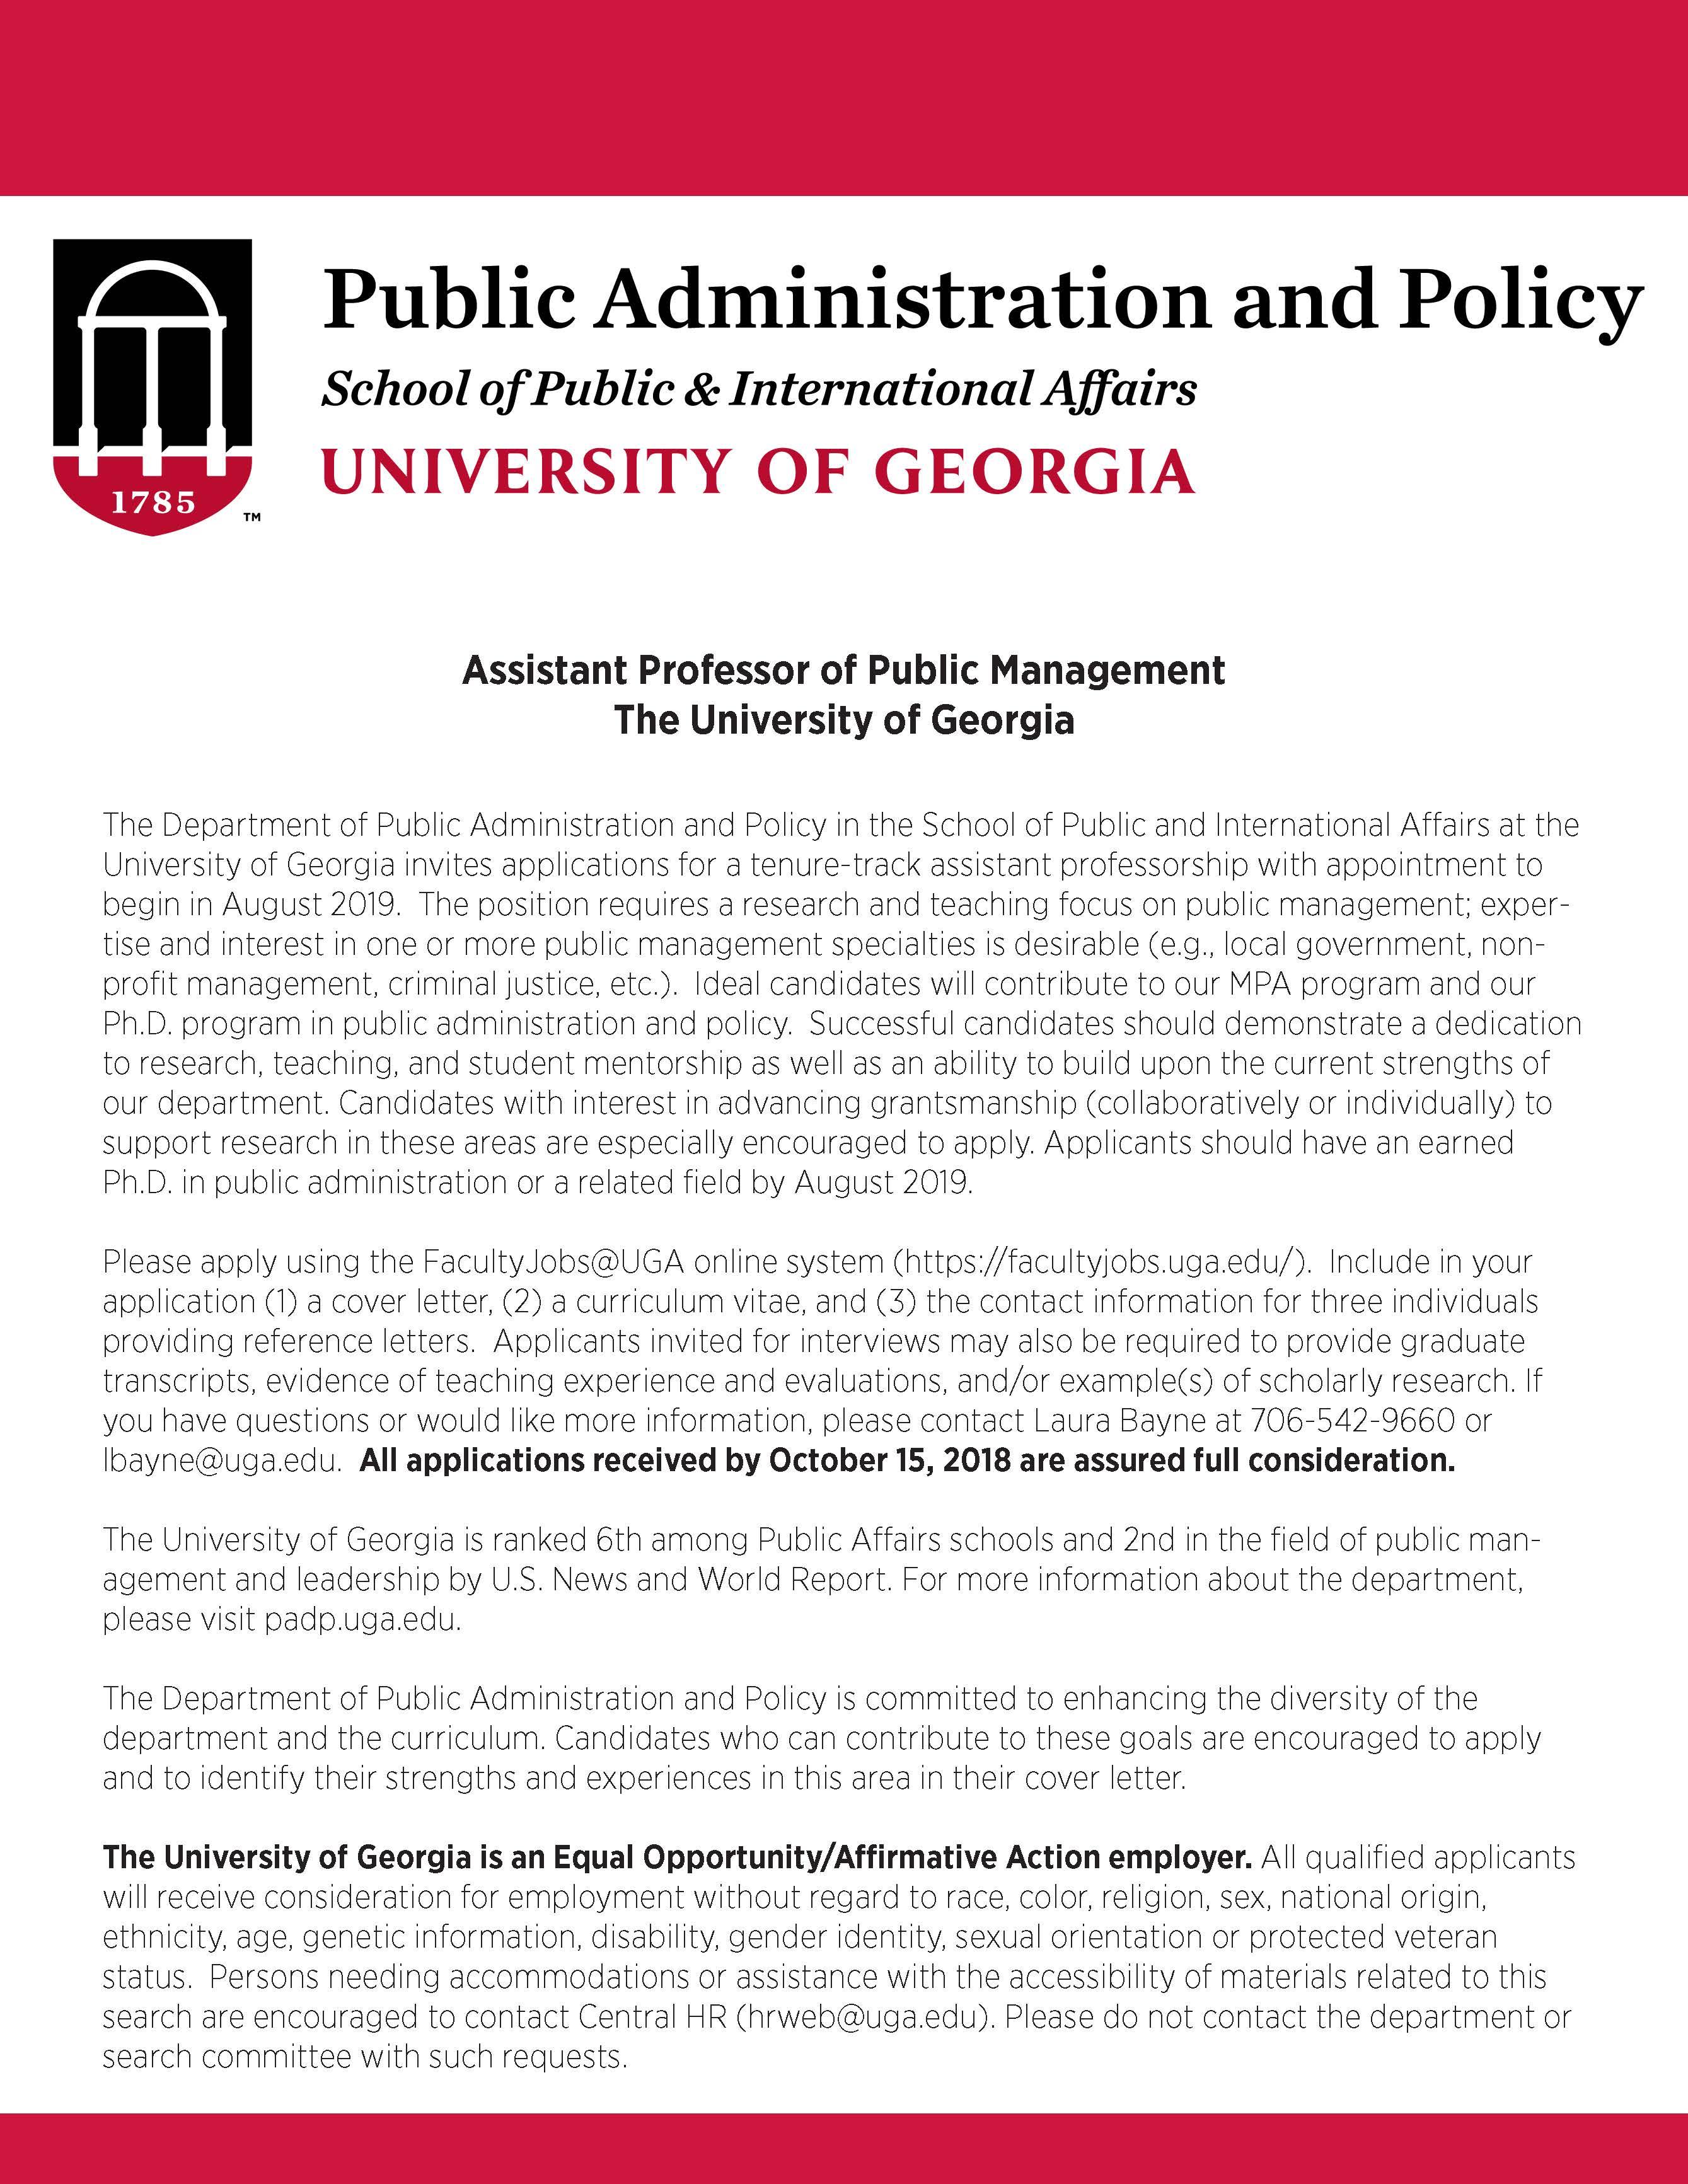 uga law cover letter - Jasonkellyphoto.co